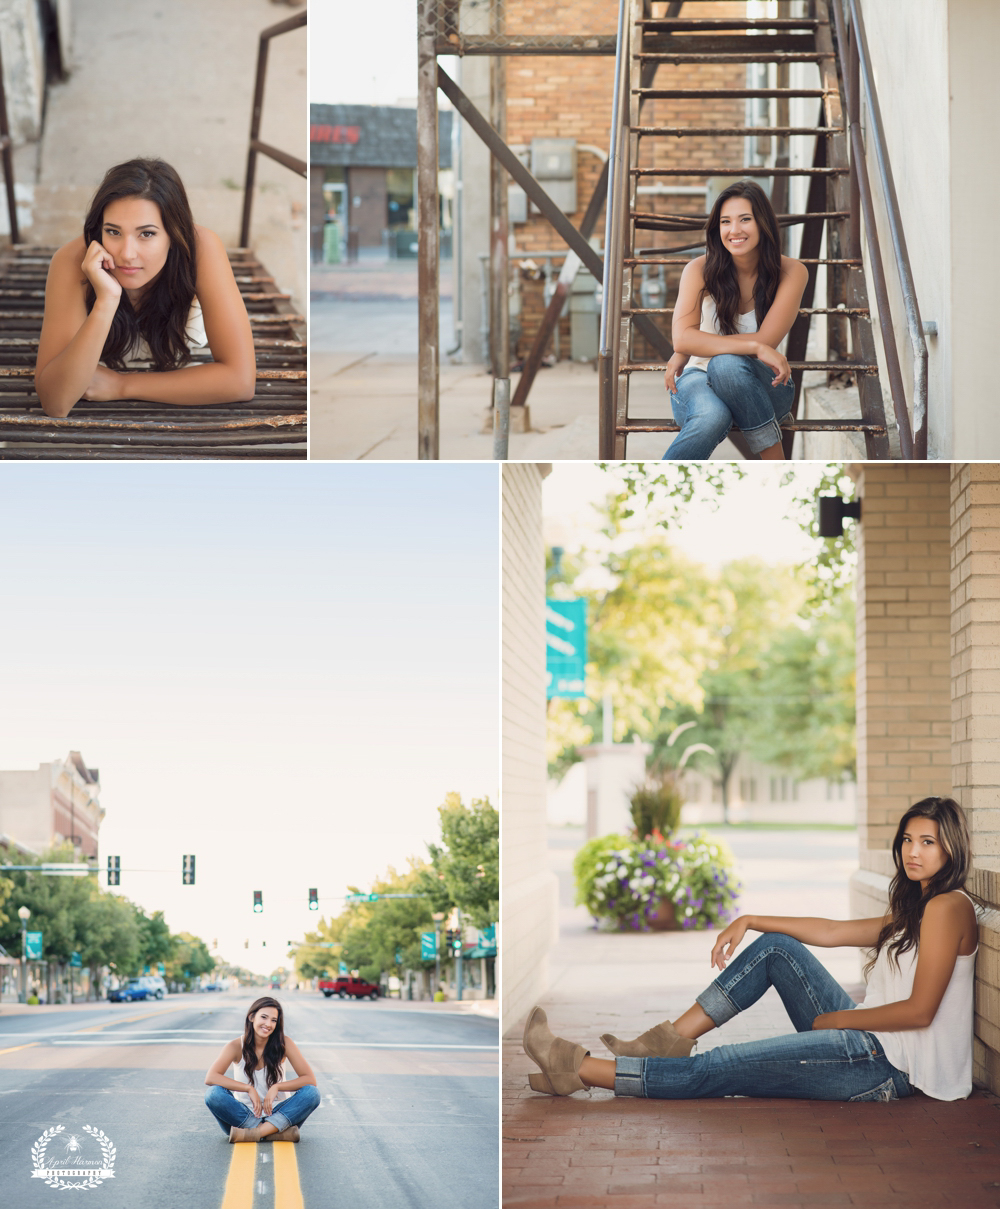 senior-photography-gardencity-ks-9.jpg